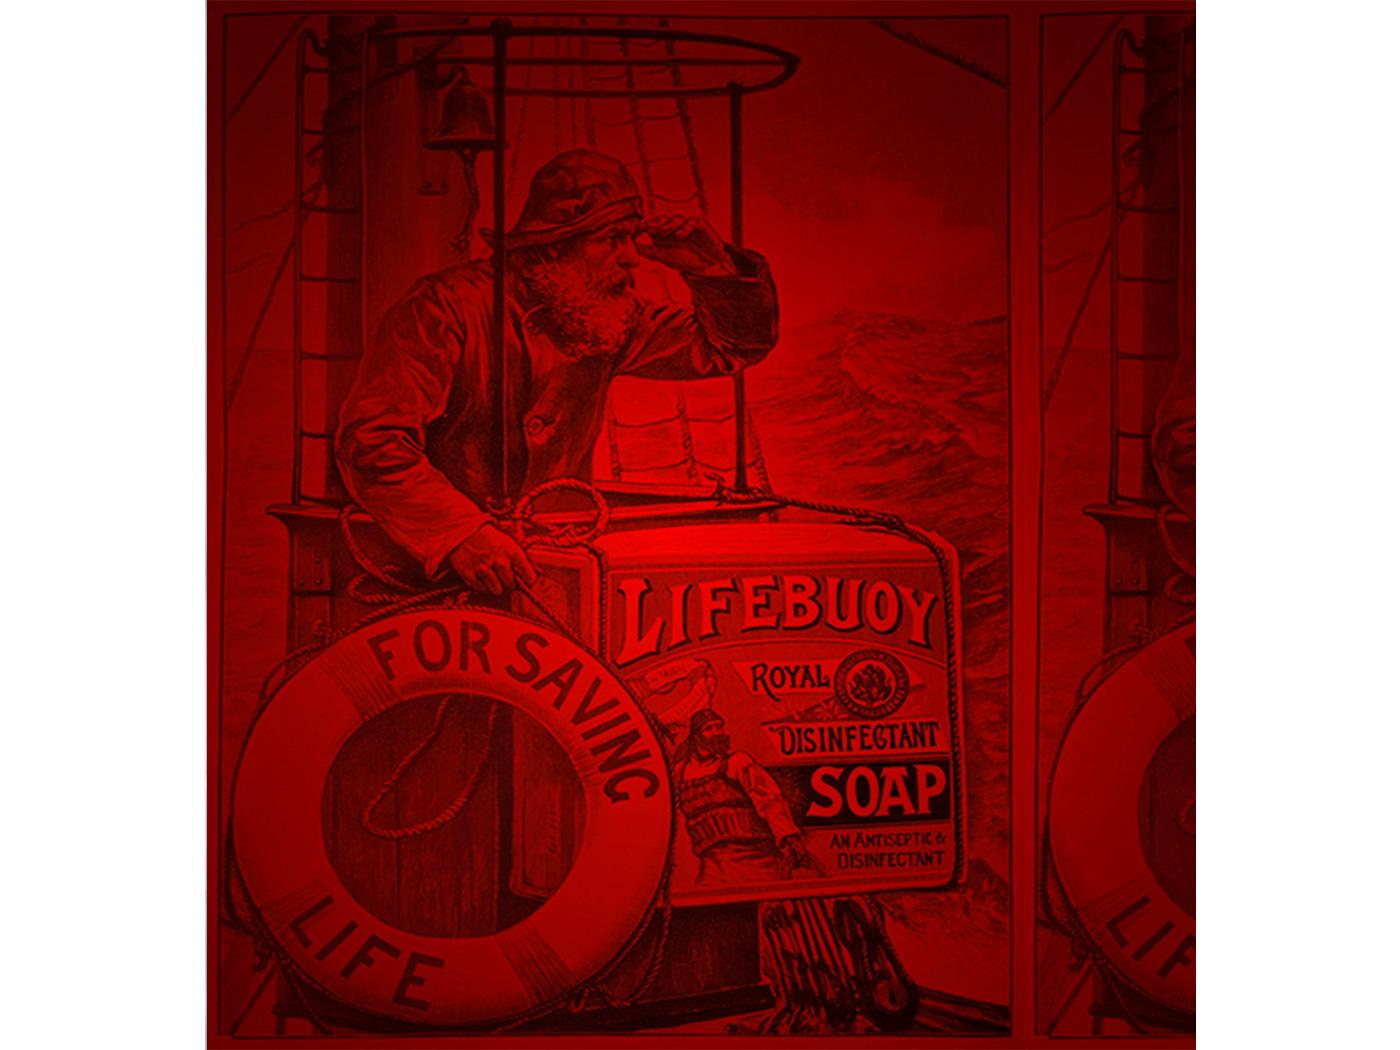 Lifebuoy: το σαπούνι – θρύλος τώρα και στην Ελλάδα!